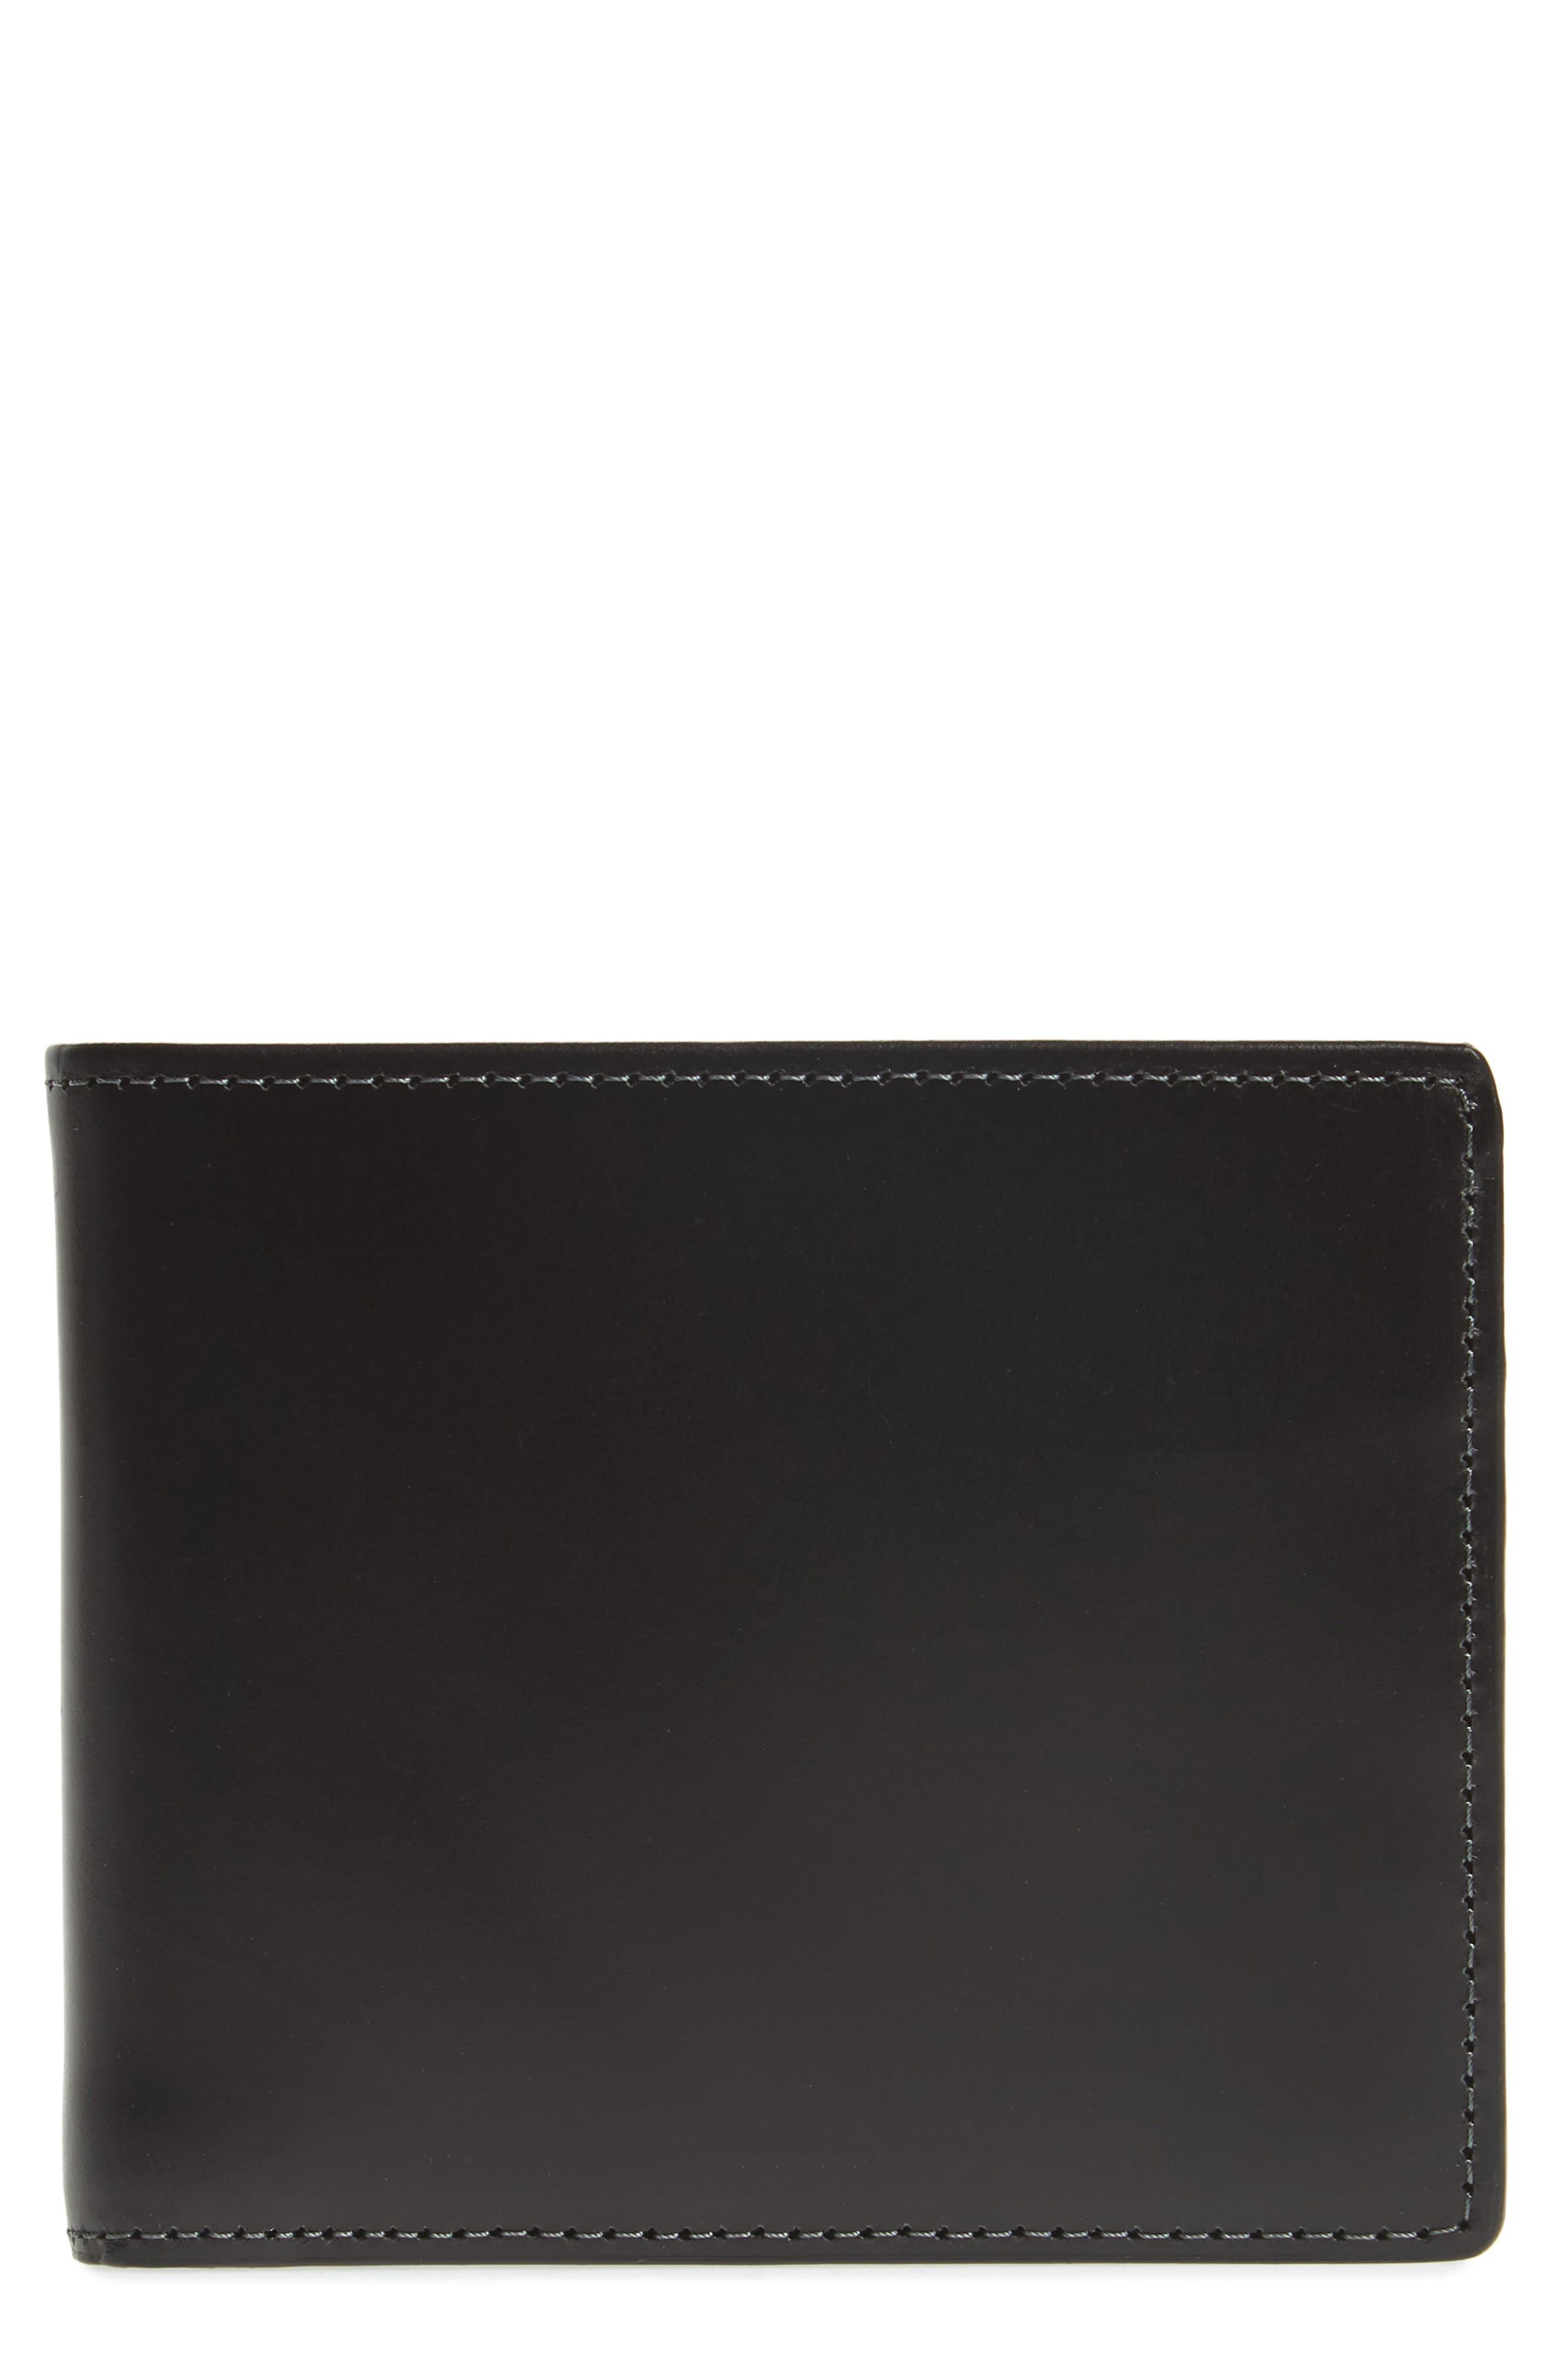 NORDSTROM MEN'S SHOP, Wyatt RFID Leather Wallet, Main thumbnail 1, color, BLACK